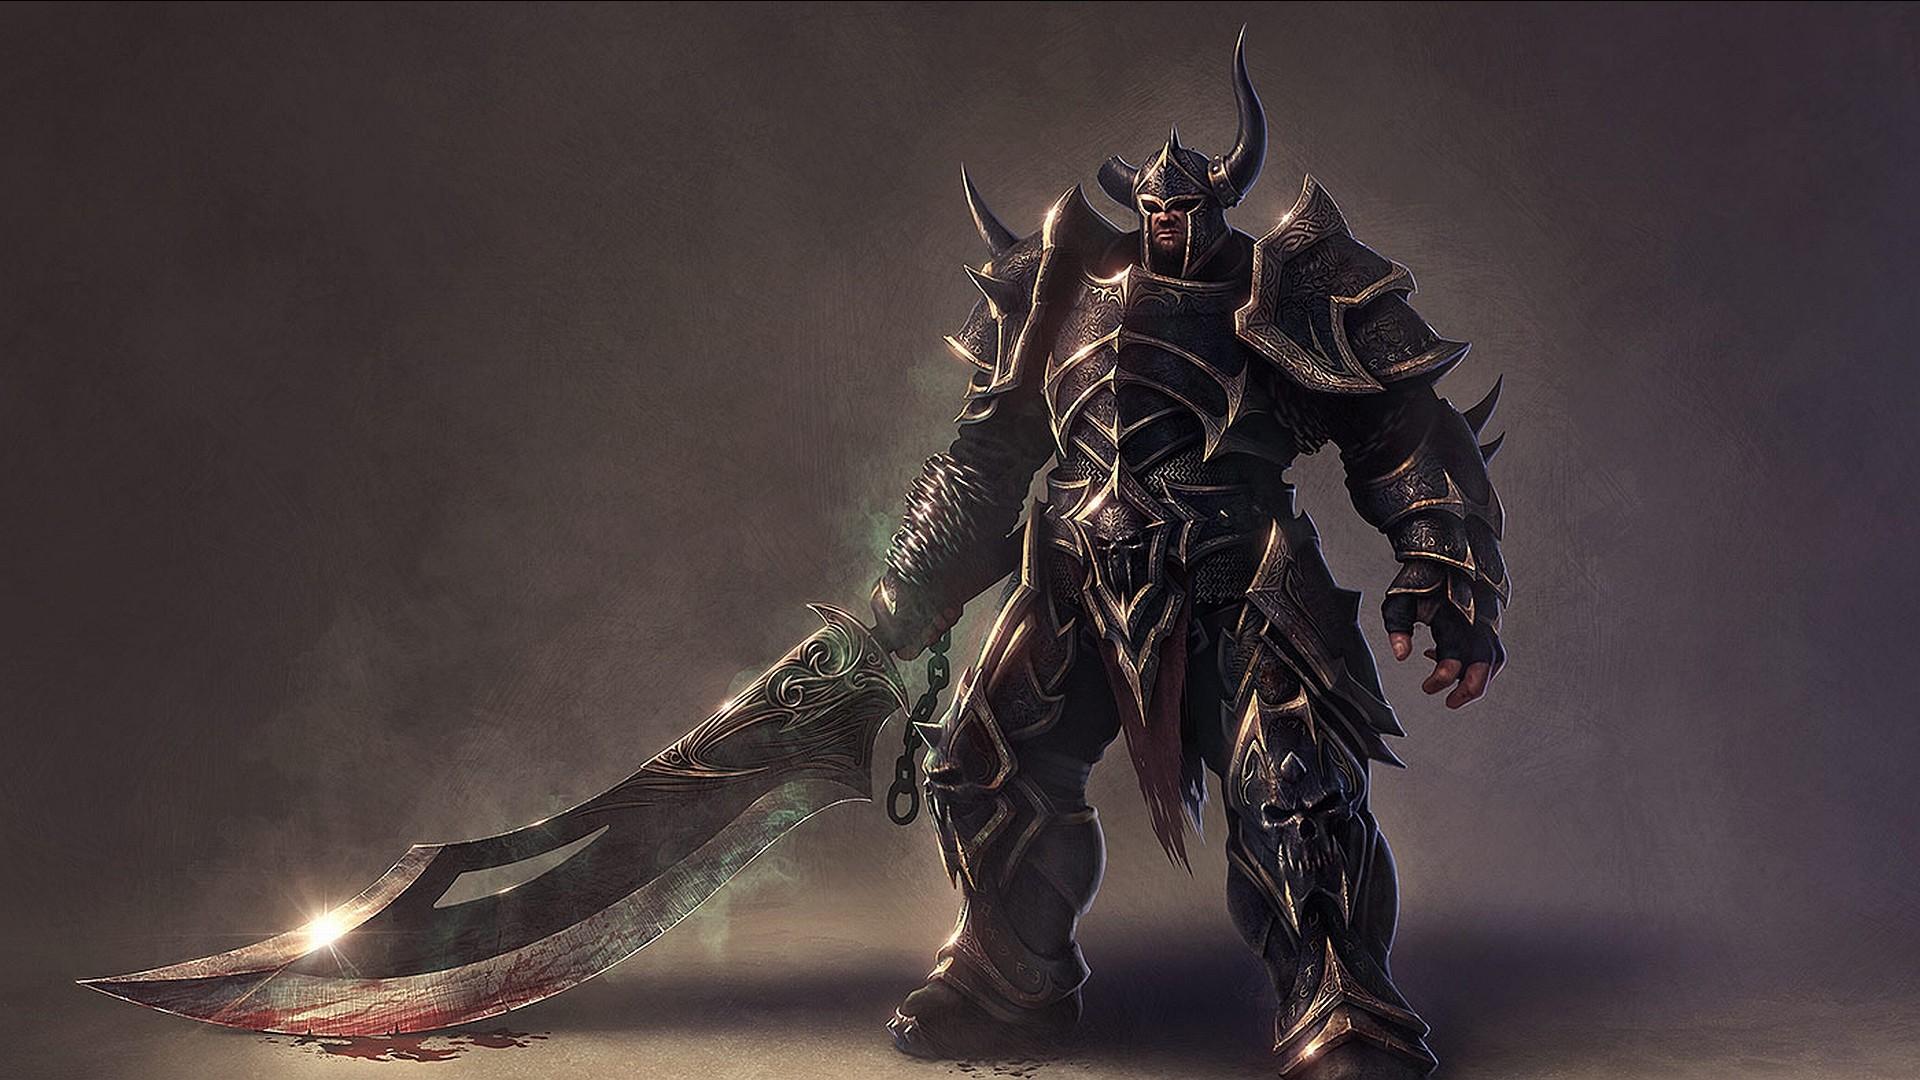 Download Fantasy Warrior Background Picture Wallpaper #61301